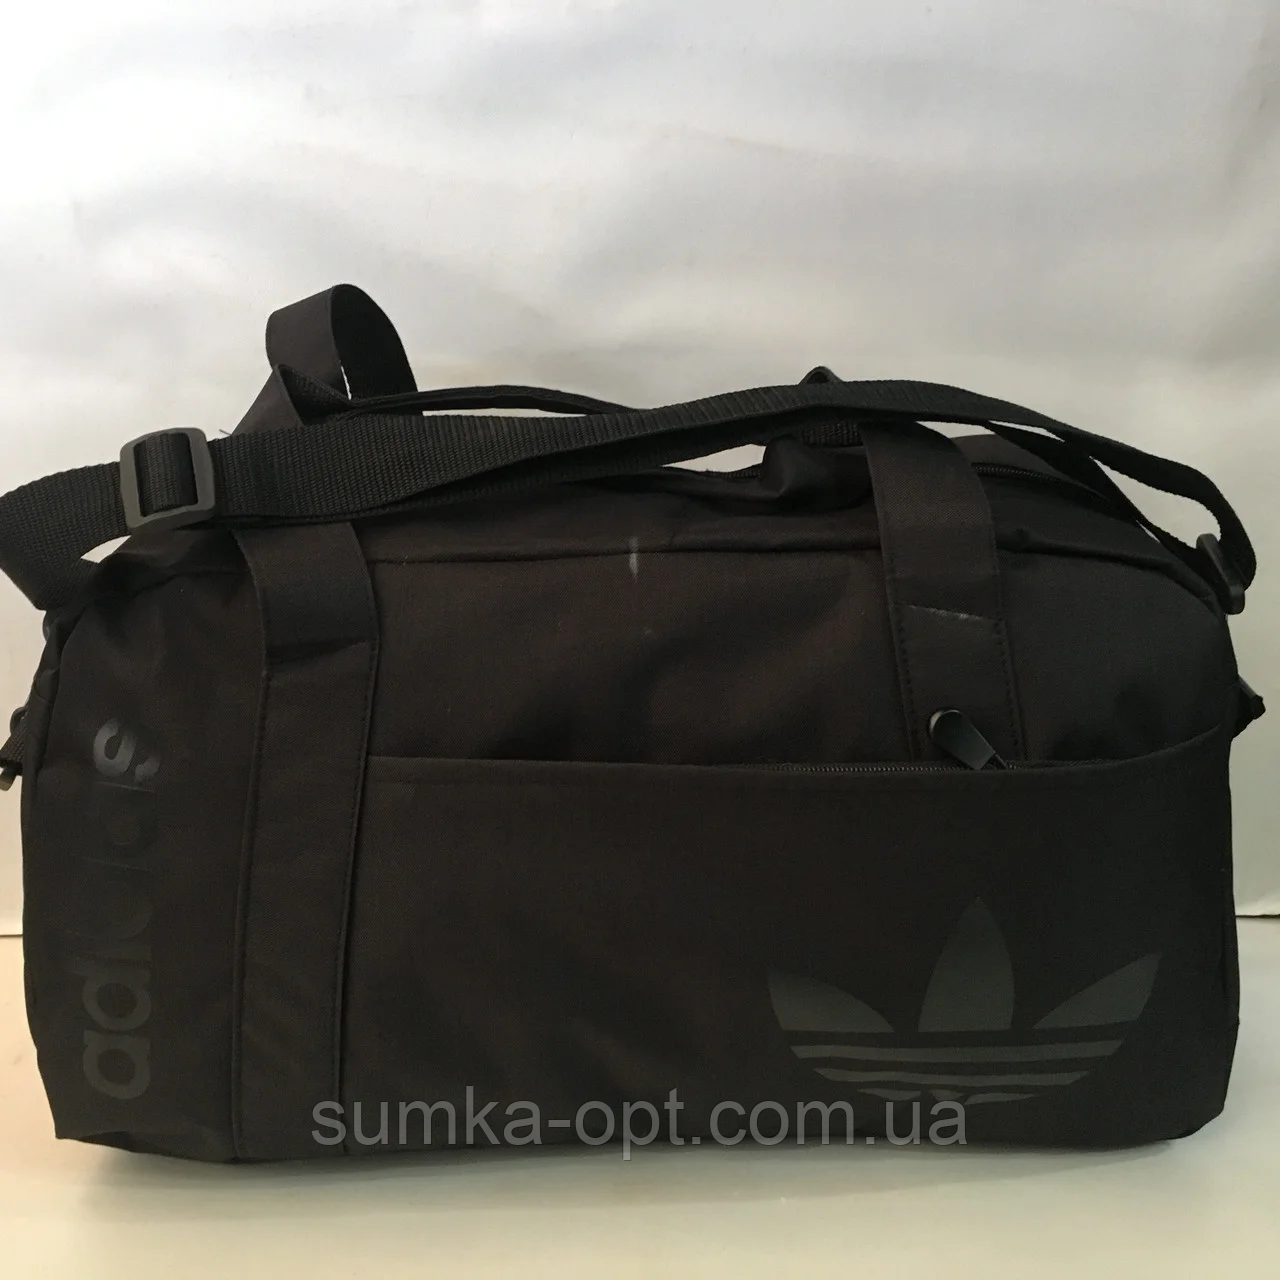 Спортивные сумки Adidas (ЧЕРНЫЙ)20х26х48см